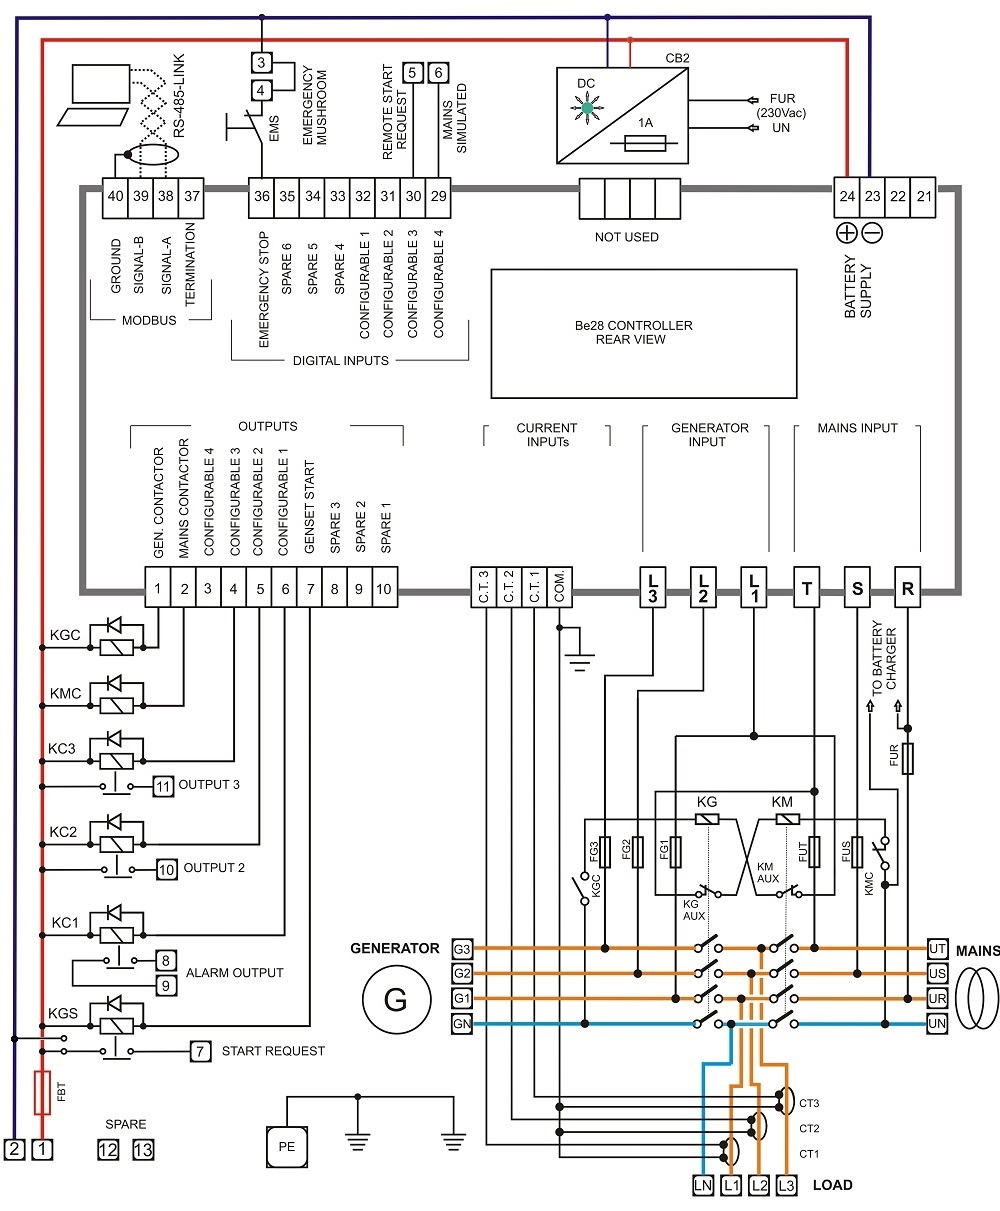 Artic Cat Atv Wiring Auto Electrical Diagram Gmdlbp Caterpillar Sr4 Generator 40